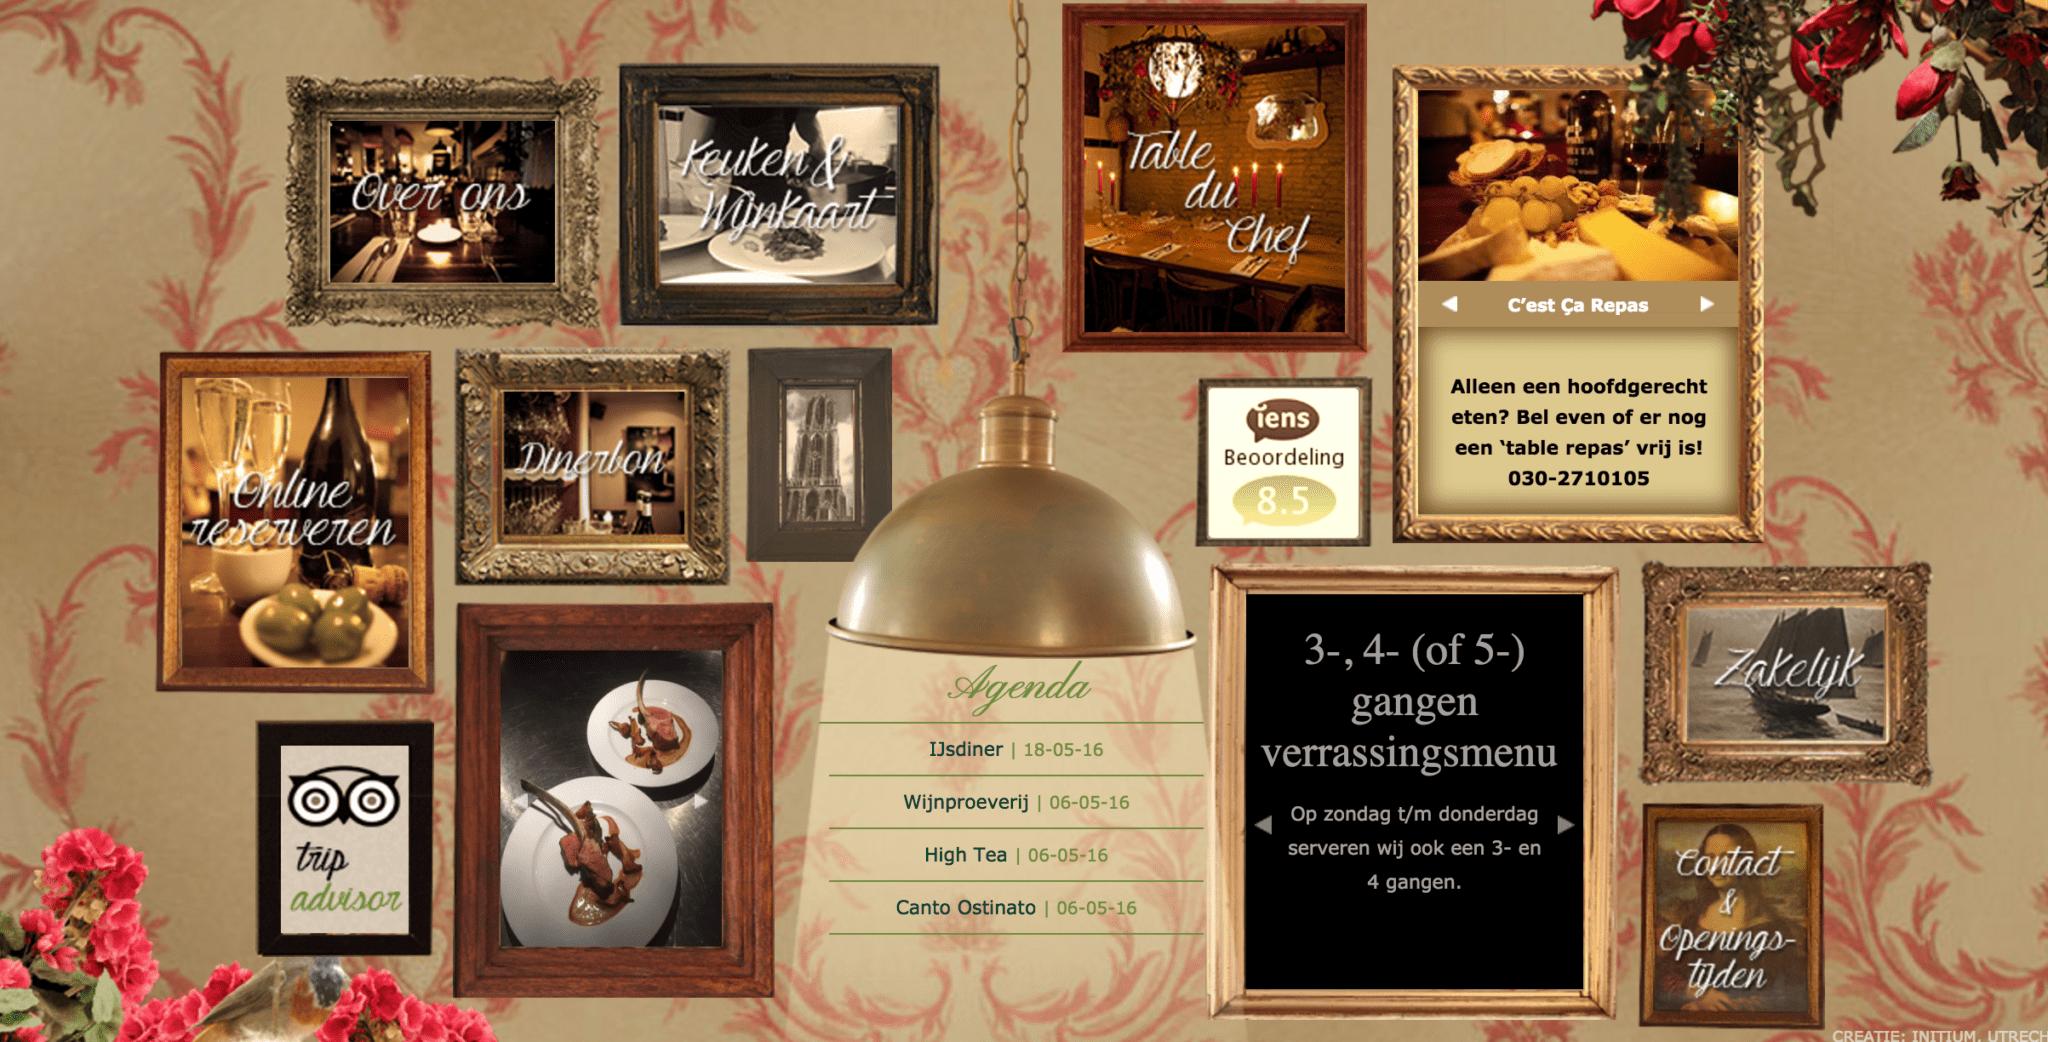 Screen Shot 2016 05 22 at 9.37.57 PM - 030 tip - Restaurant C'est Ca + Roberto Gelato diner